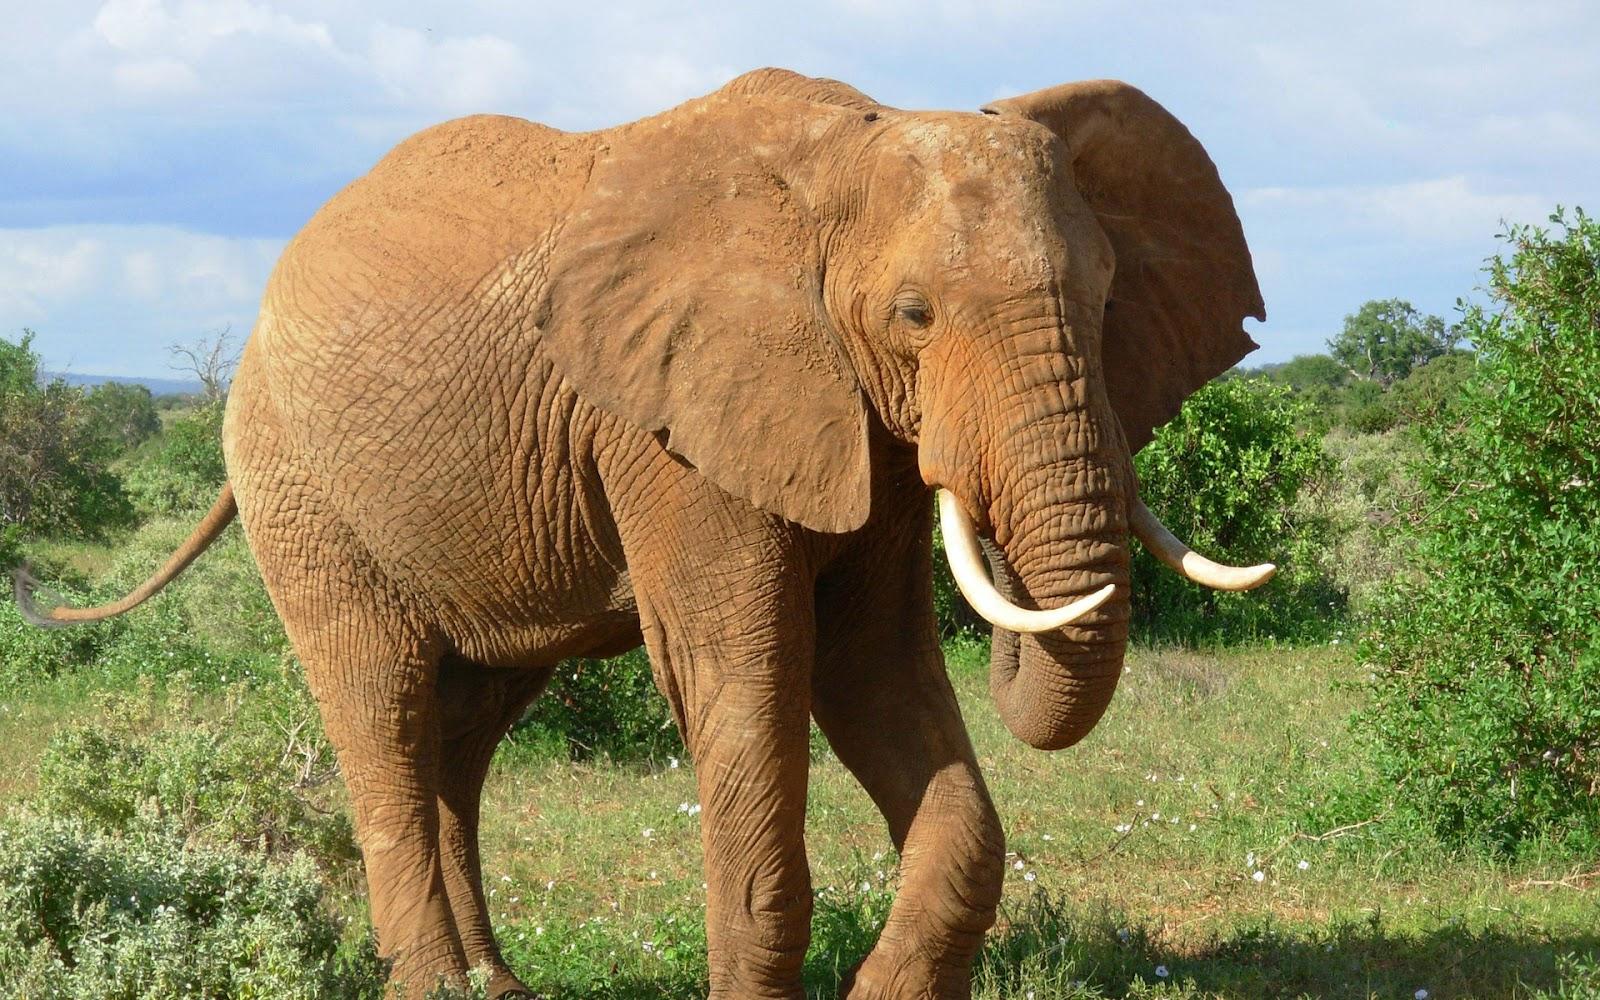 Wallpaper download elephant - Beautiful Elephants High Resolution Images